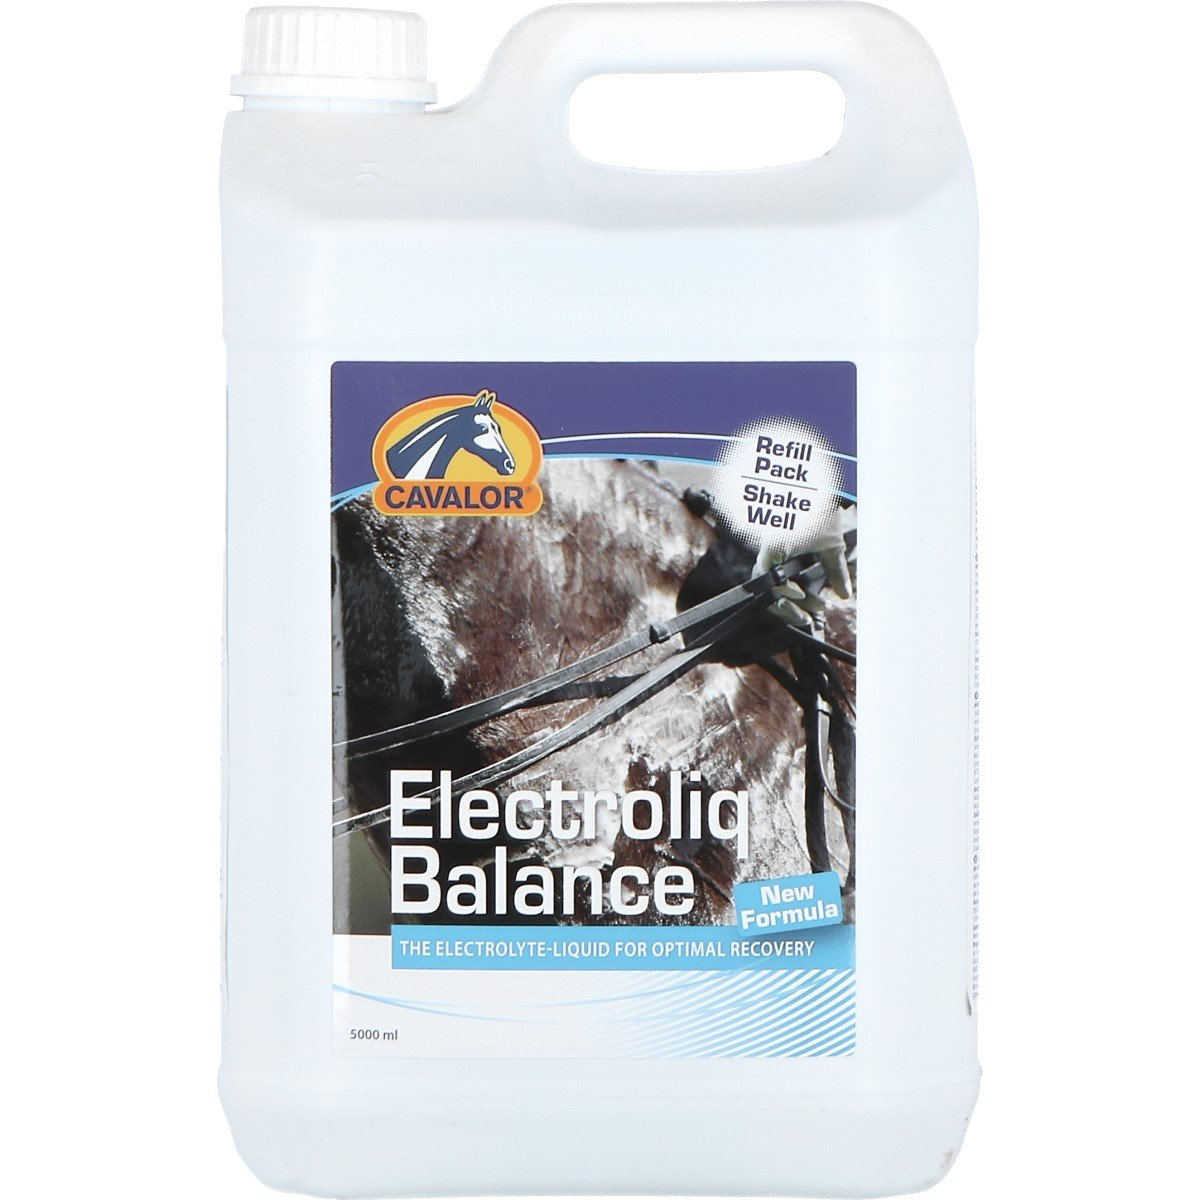 Afbeelding van Cavalor Electroliq Balance 5ltr